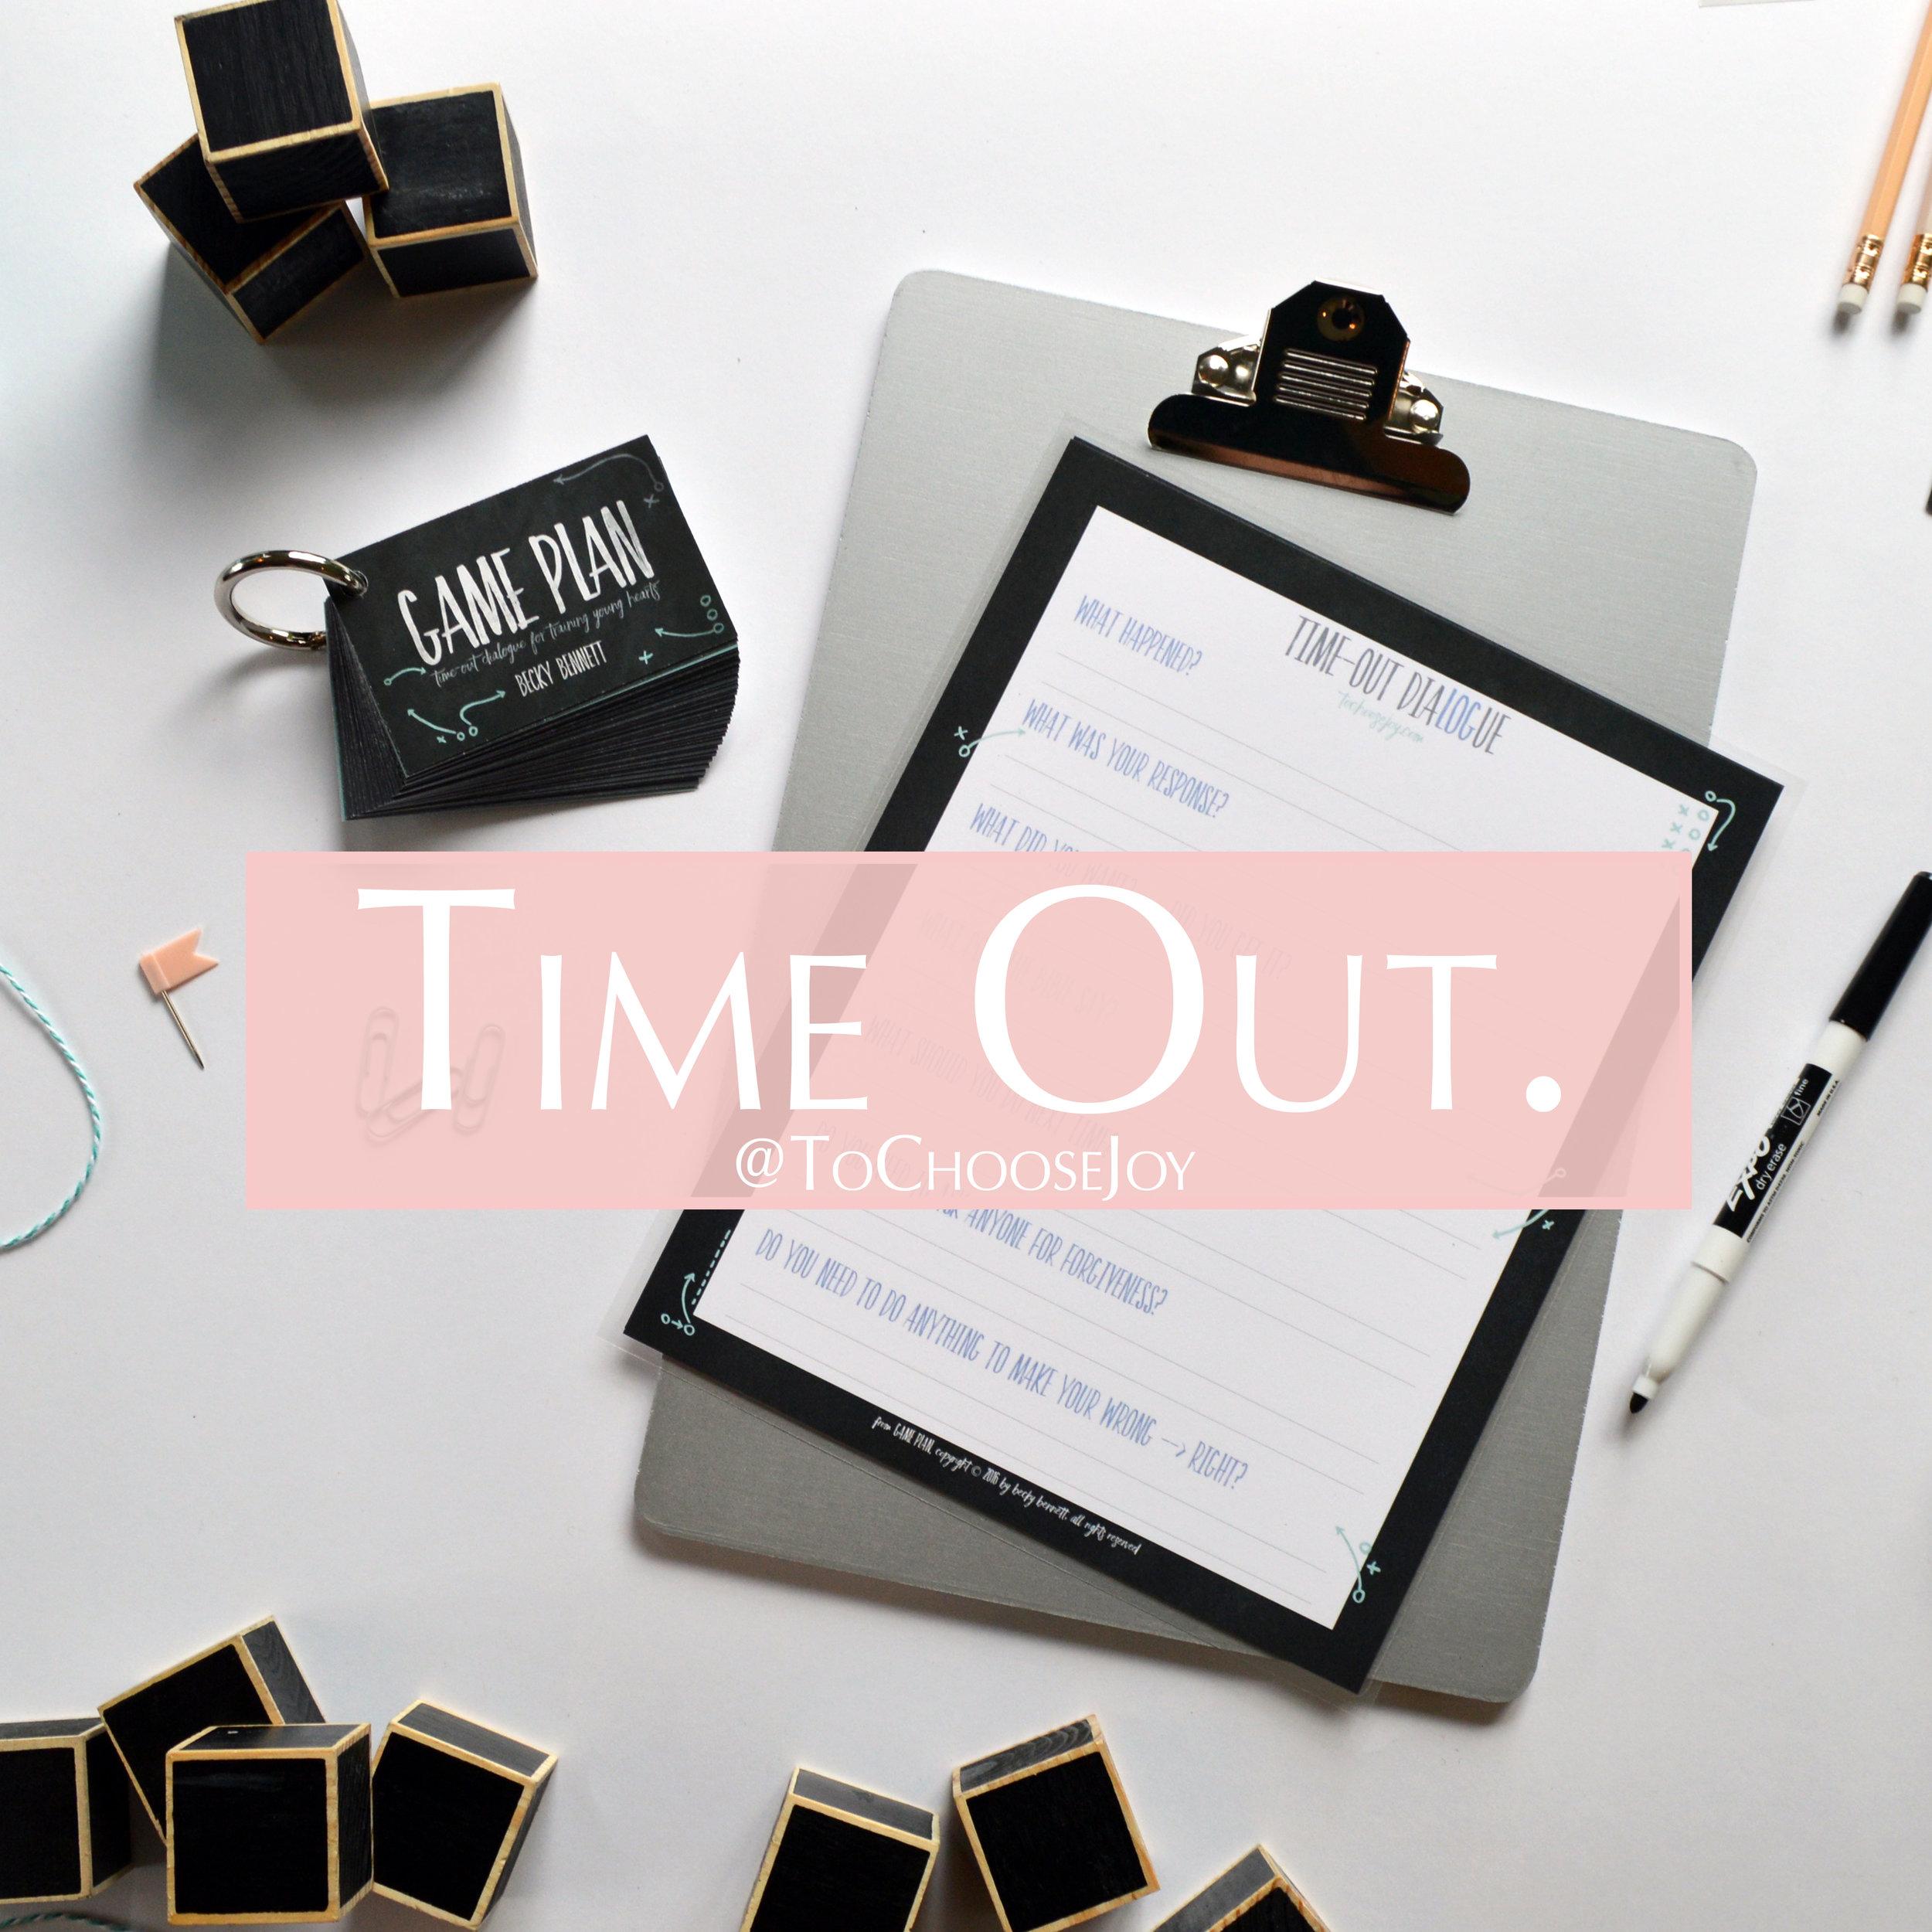 Game Plan_Becky Bennett_Parenting_Time Out Dialogue